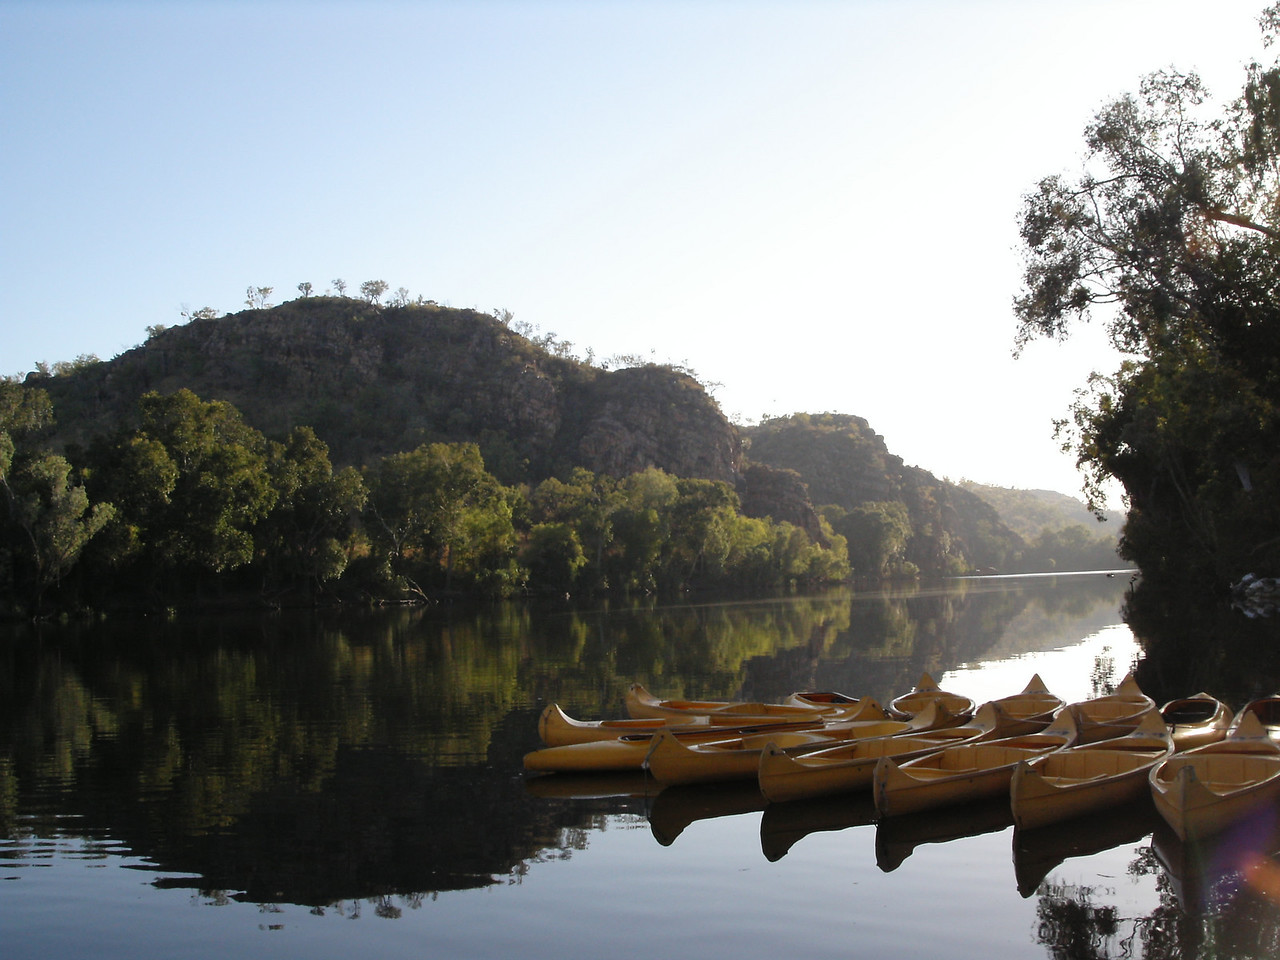 Canoes at Katherine Gorge